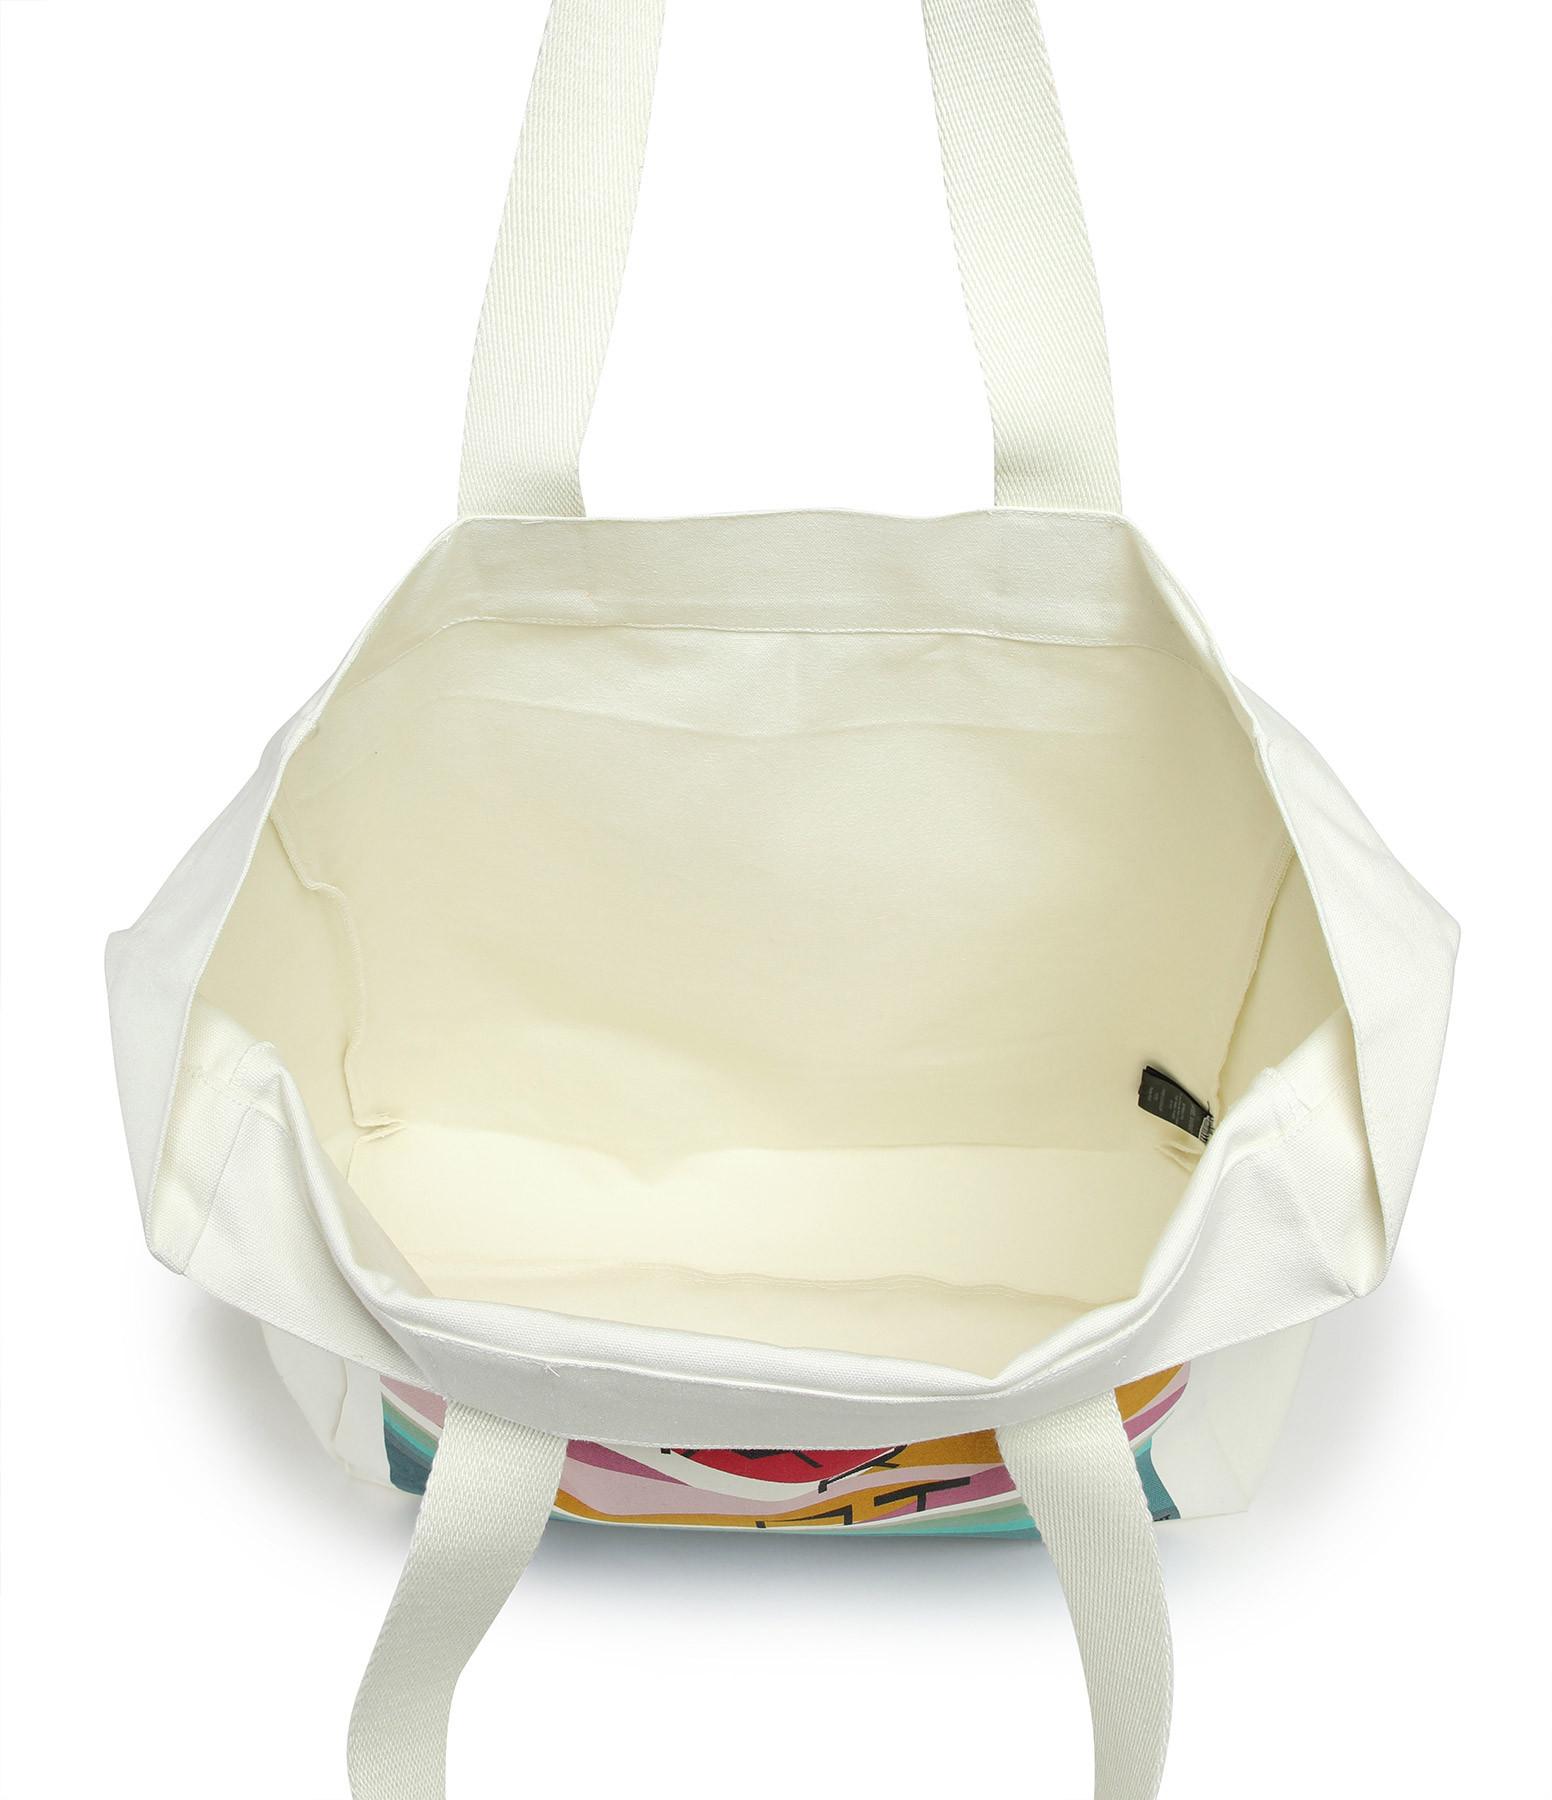 ISABEL MARANT - Sac Tote Bag Coton Ecru